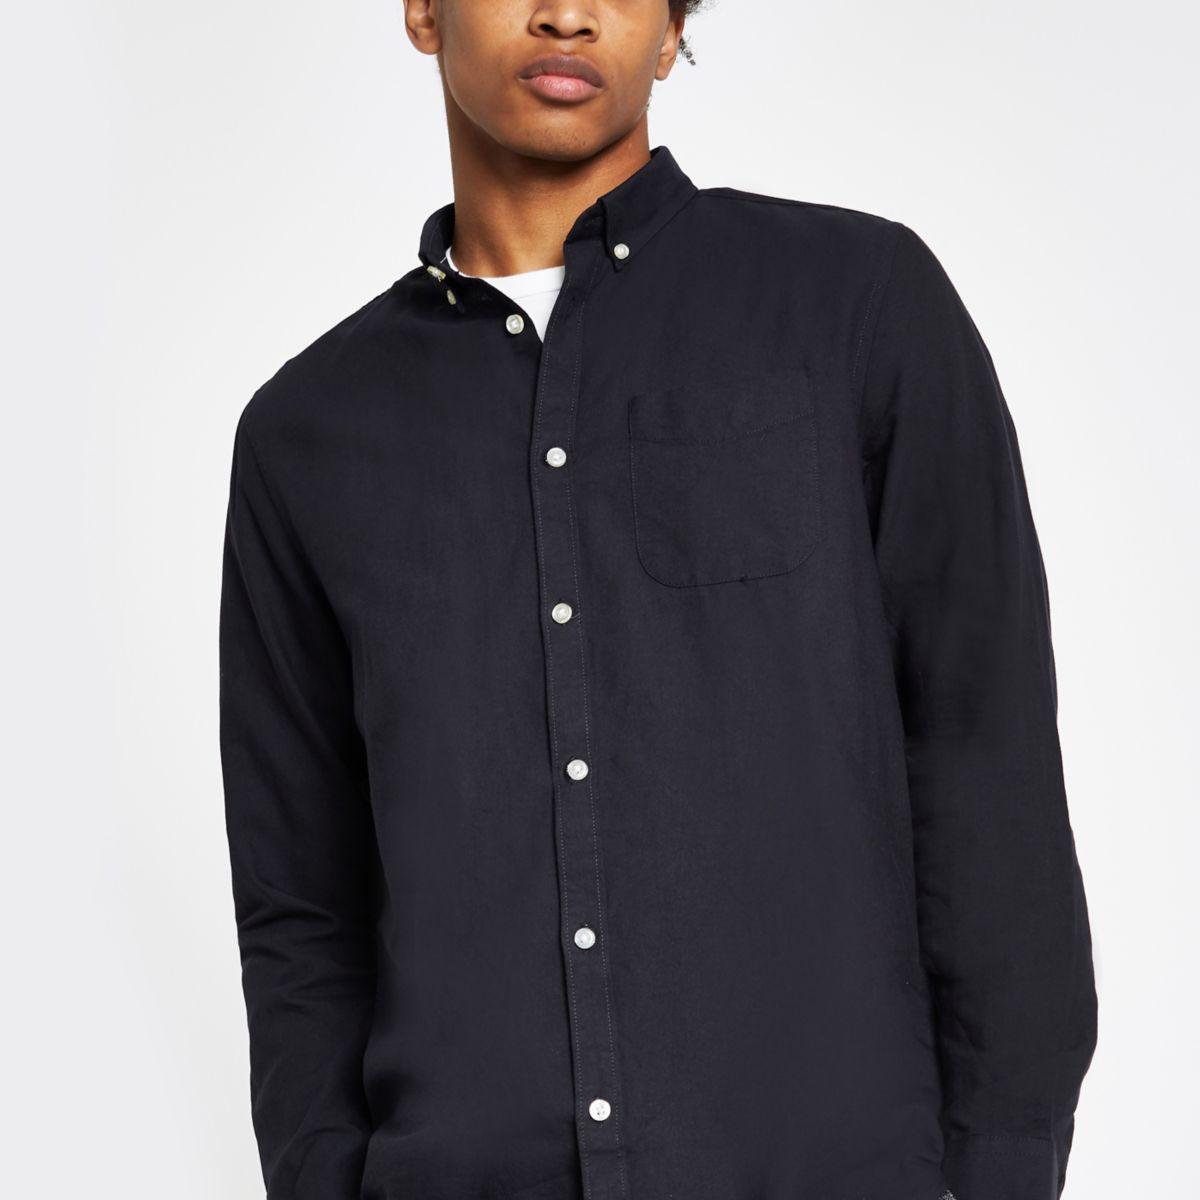 Navy Oxford long sleeve shirt